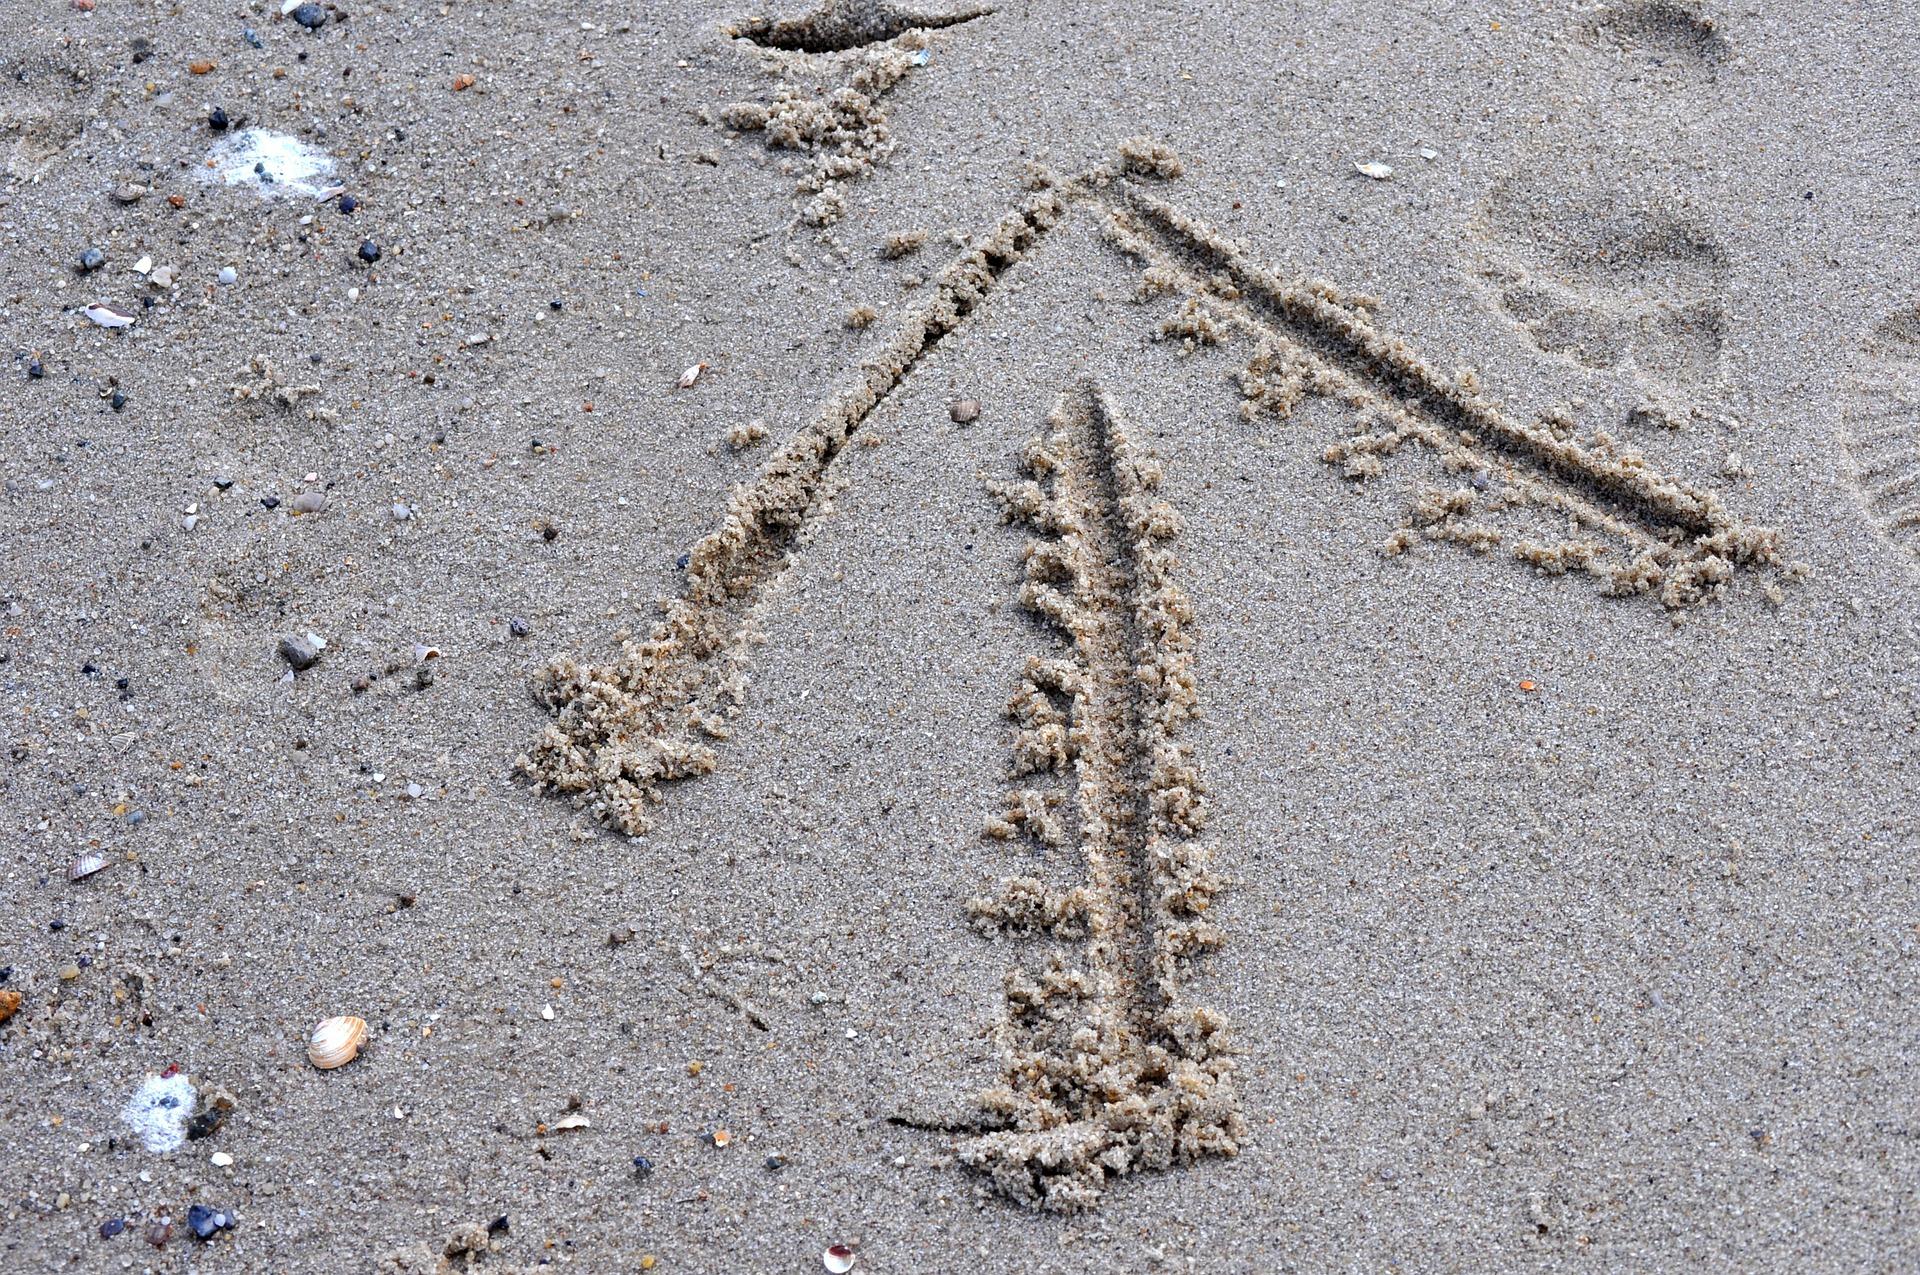 sand-1522182_1920.jpg